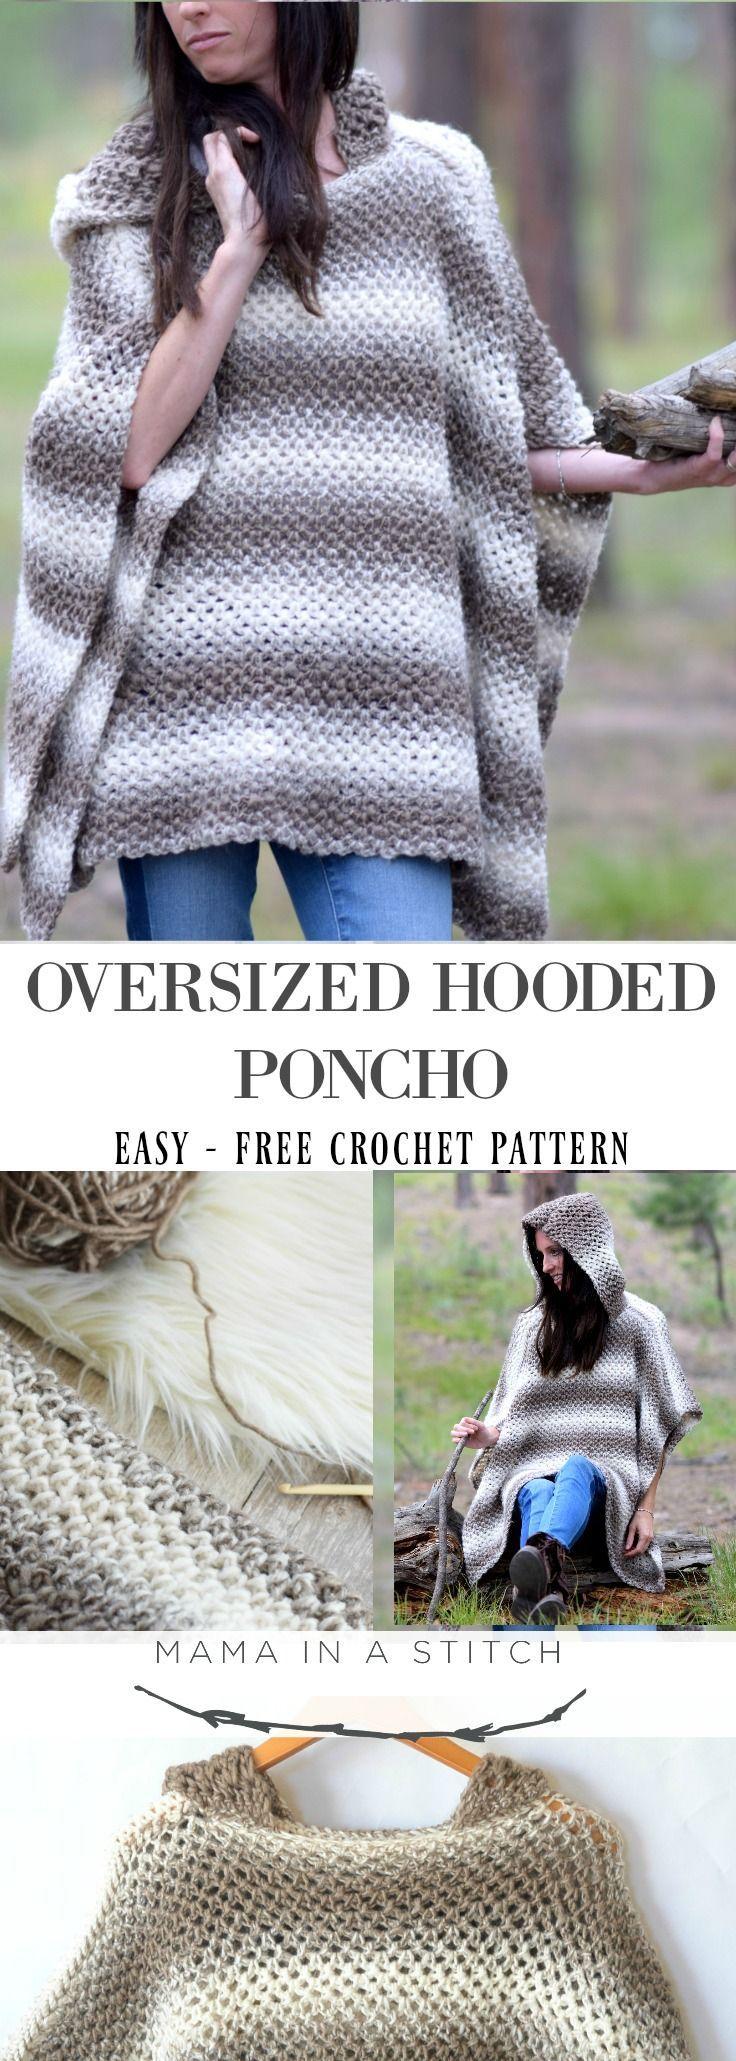 Driftwood Oversized Crochet Hooded Poncho Pattern